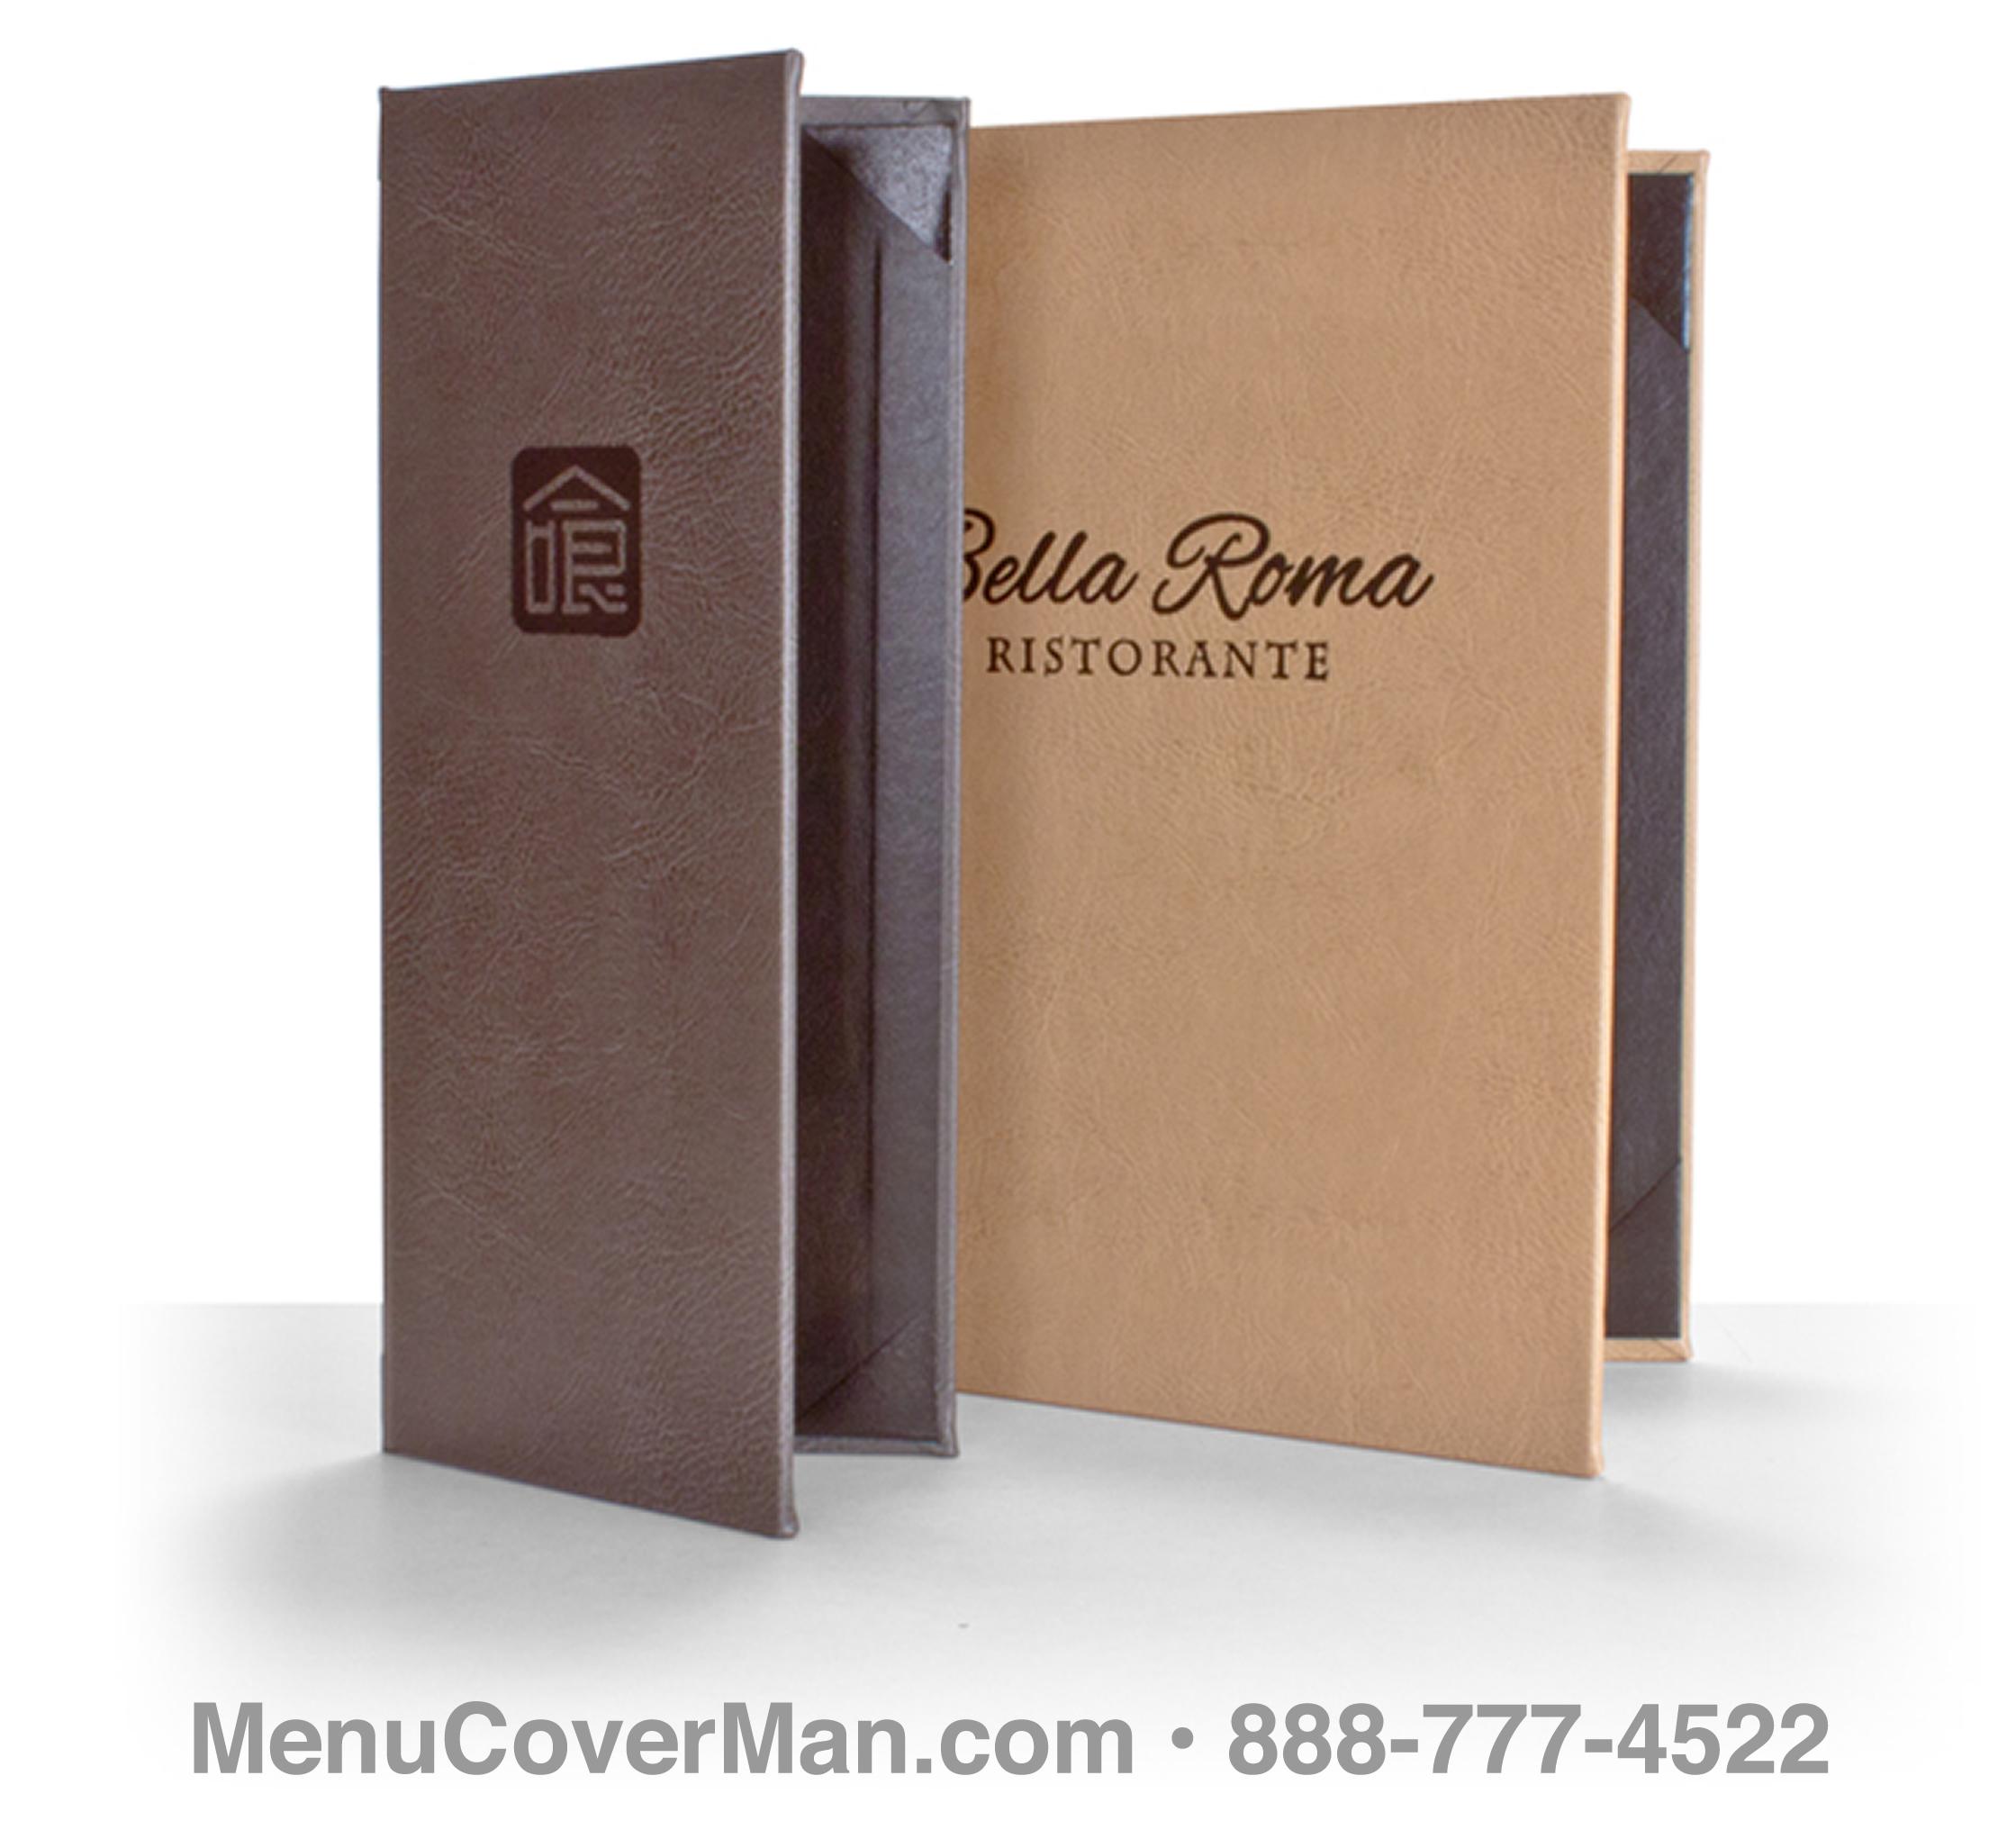 fancy menu covers